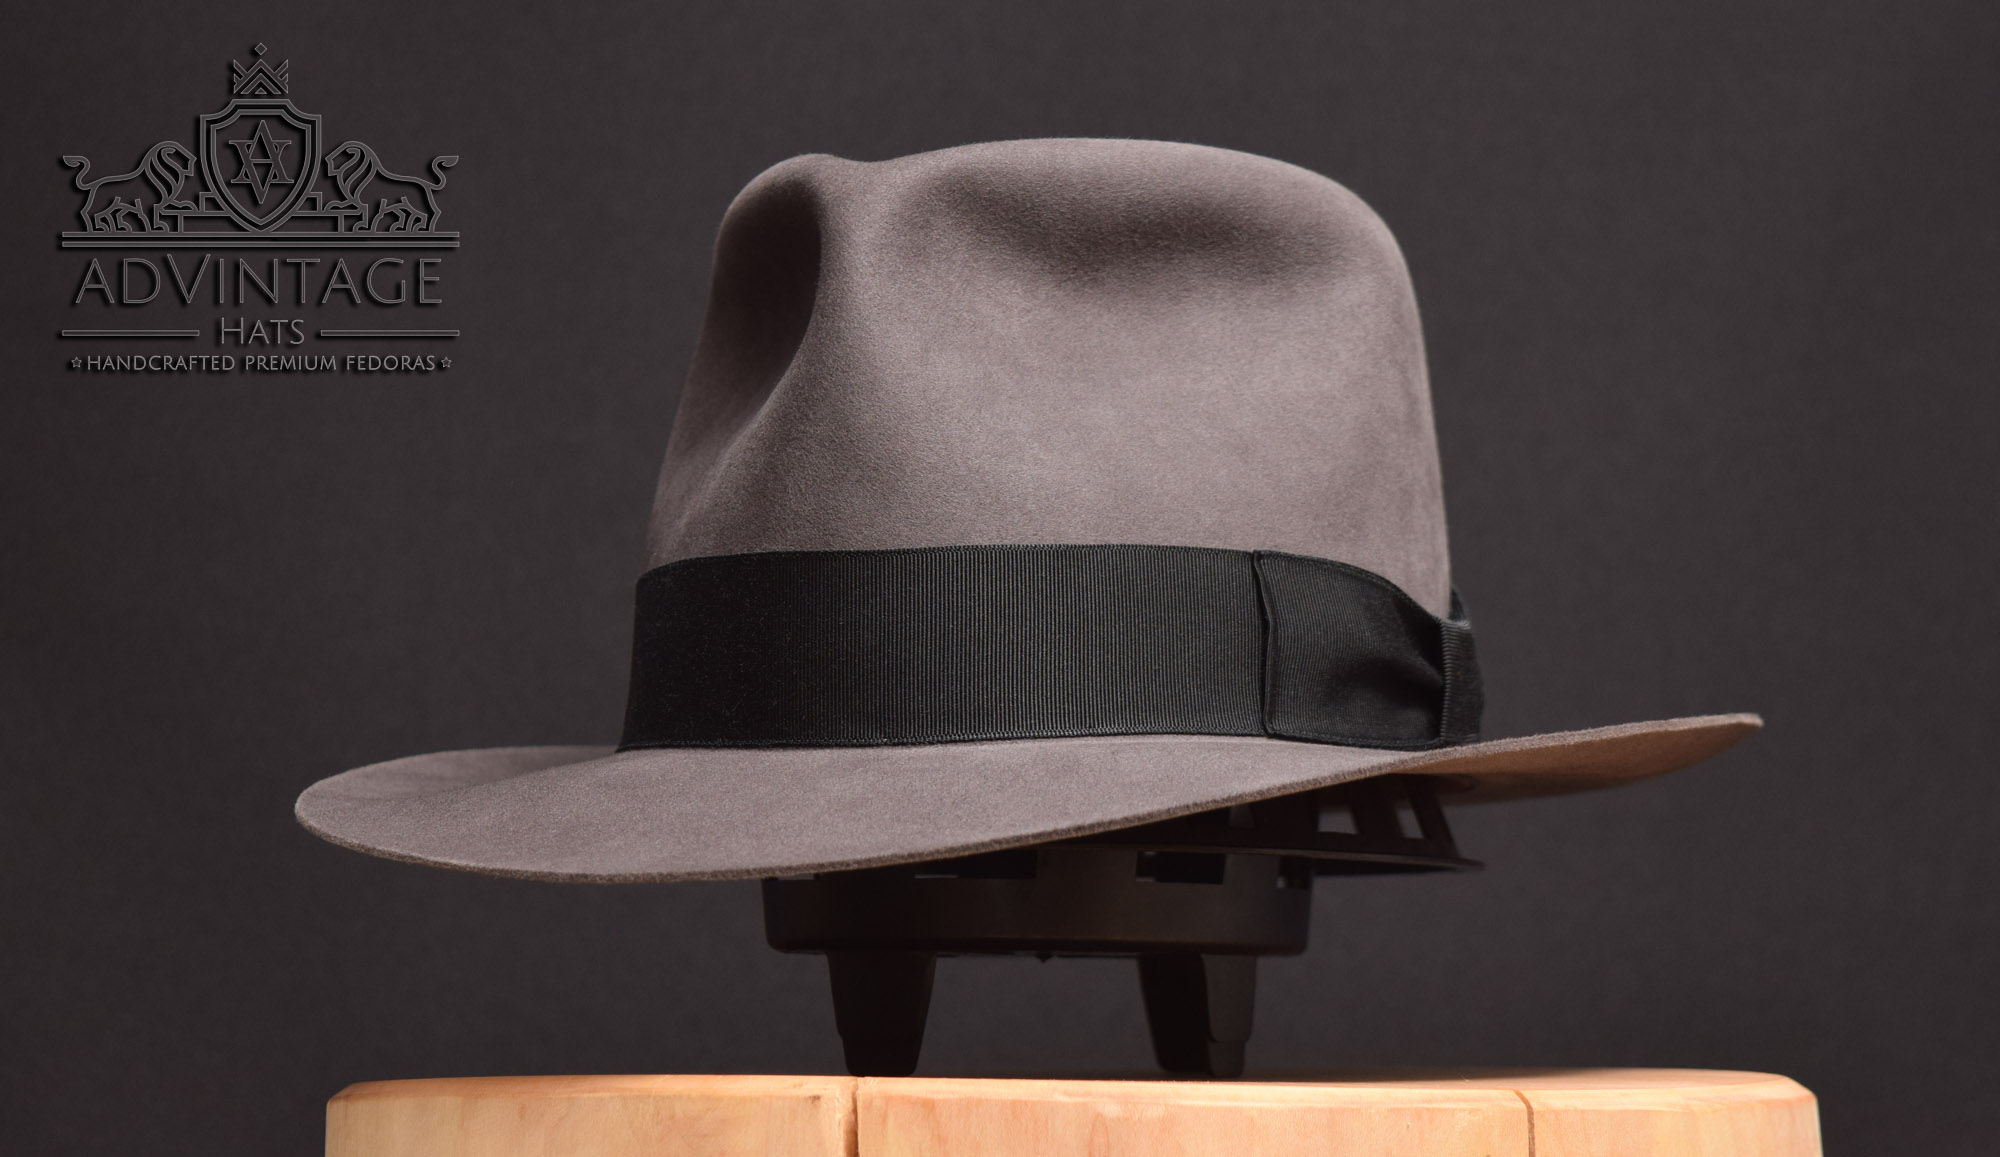 advintage masterpiece fedora hut hat kingdom crystal skull grey